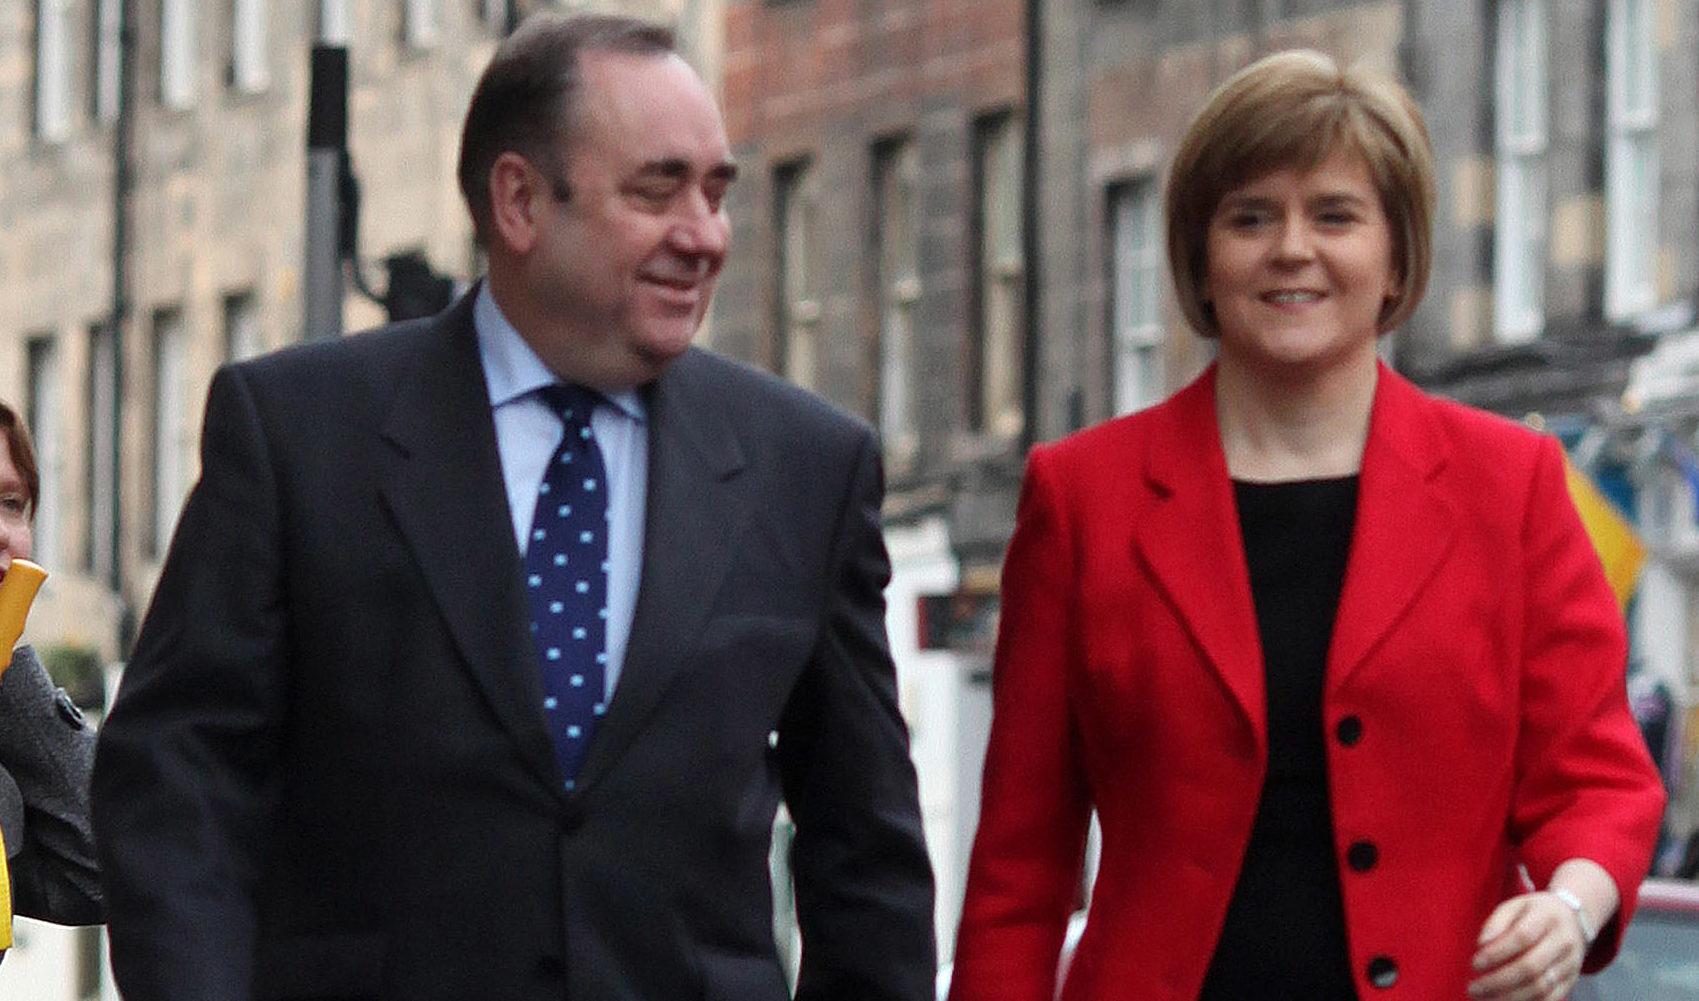 Alex Salmond and Nicola Sturgeon. (Allan Milligan)